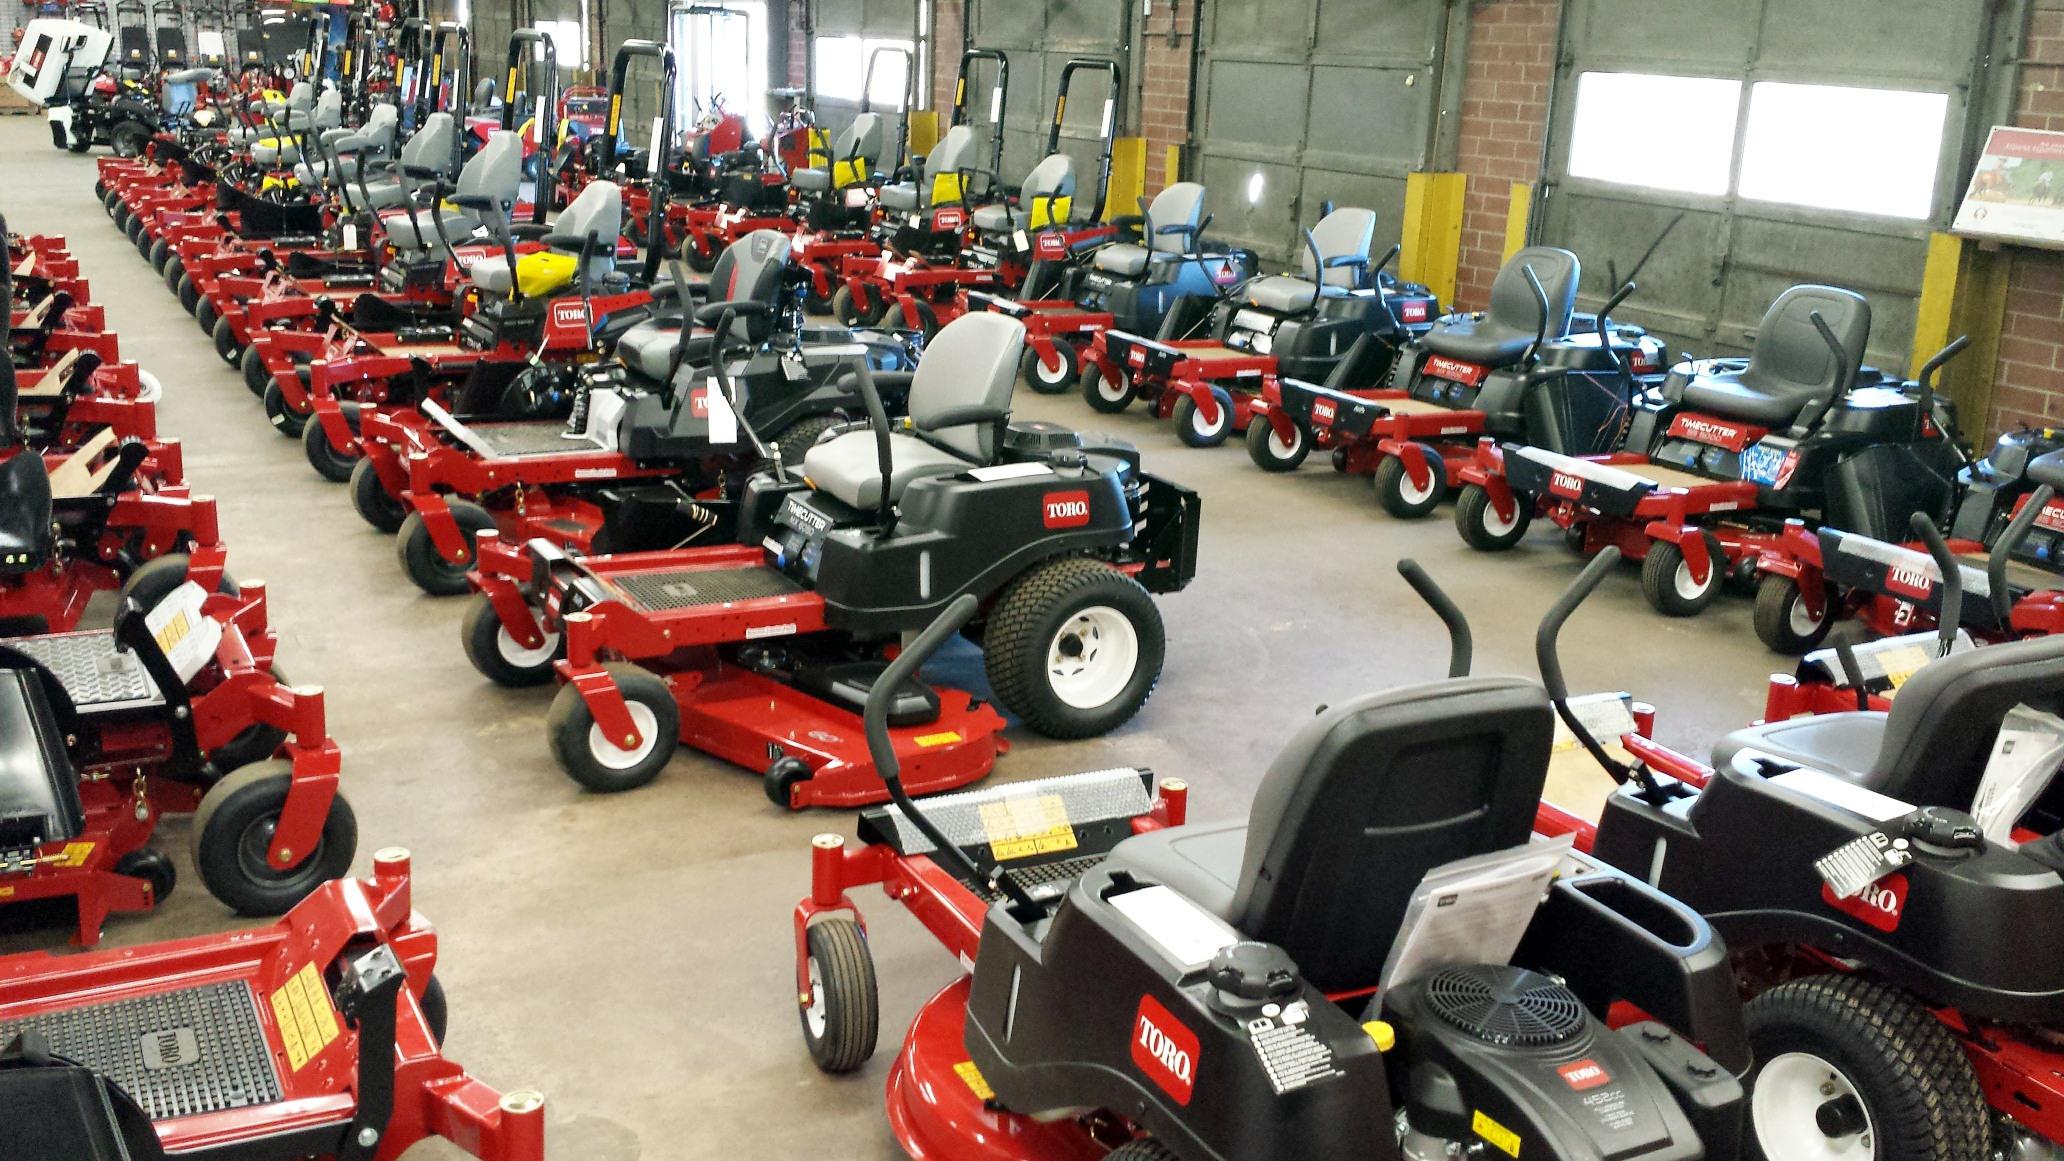 Branson Tractor South 4416 Groometown Rd, Greensboro, NC